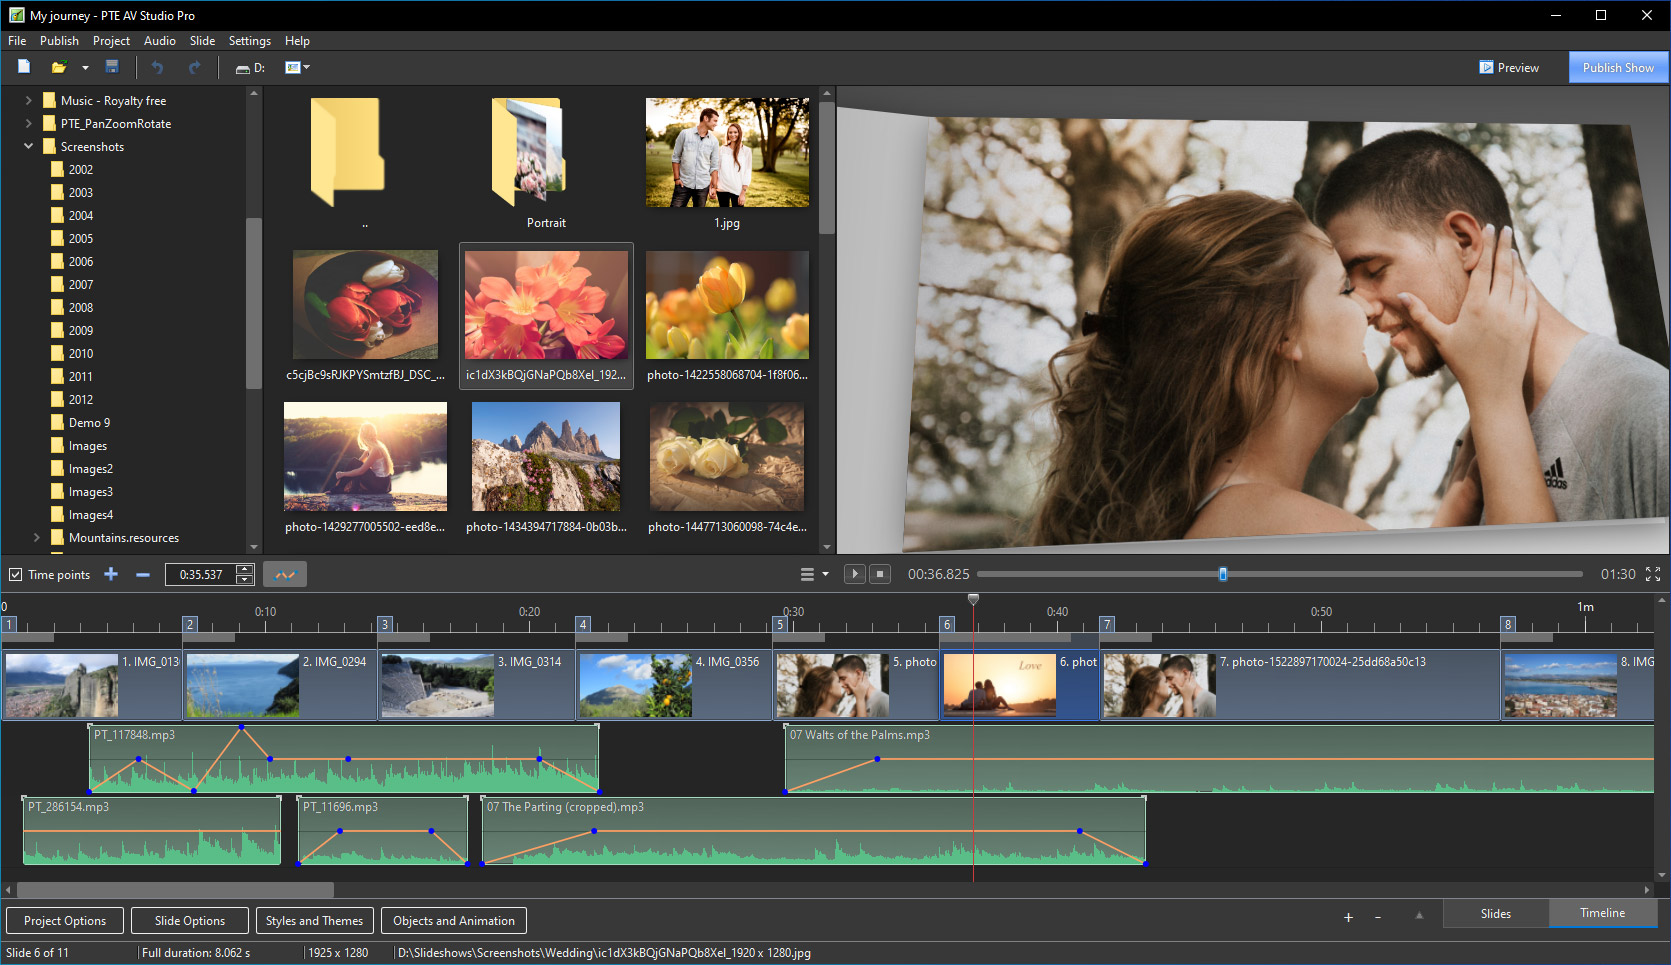 PTE AV Studio Pro 10.5.2 多國語言免安裝 - 專業照片幻燈片製作軟體 - 軟體吧